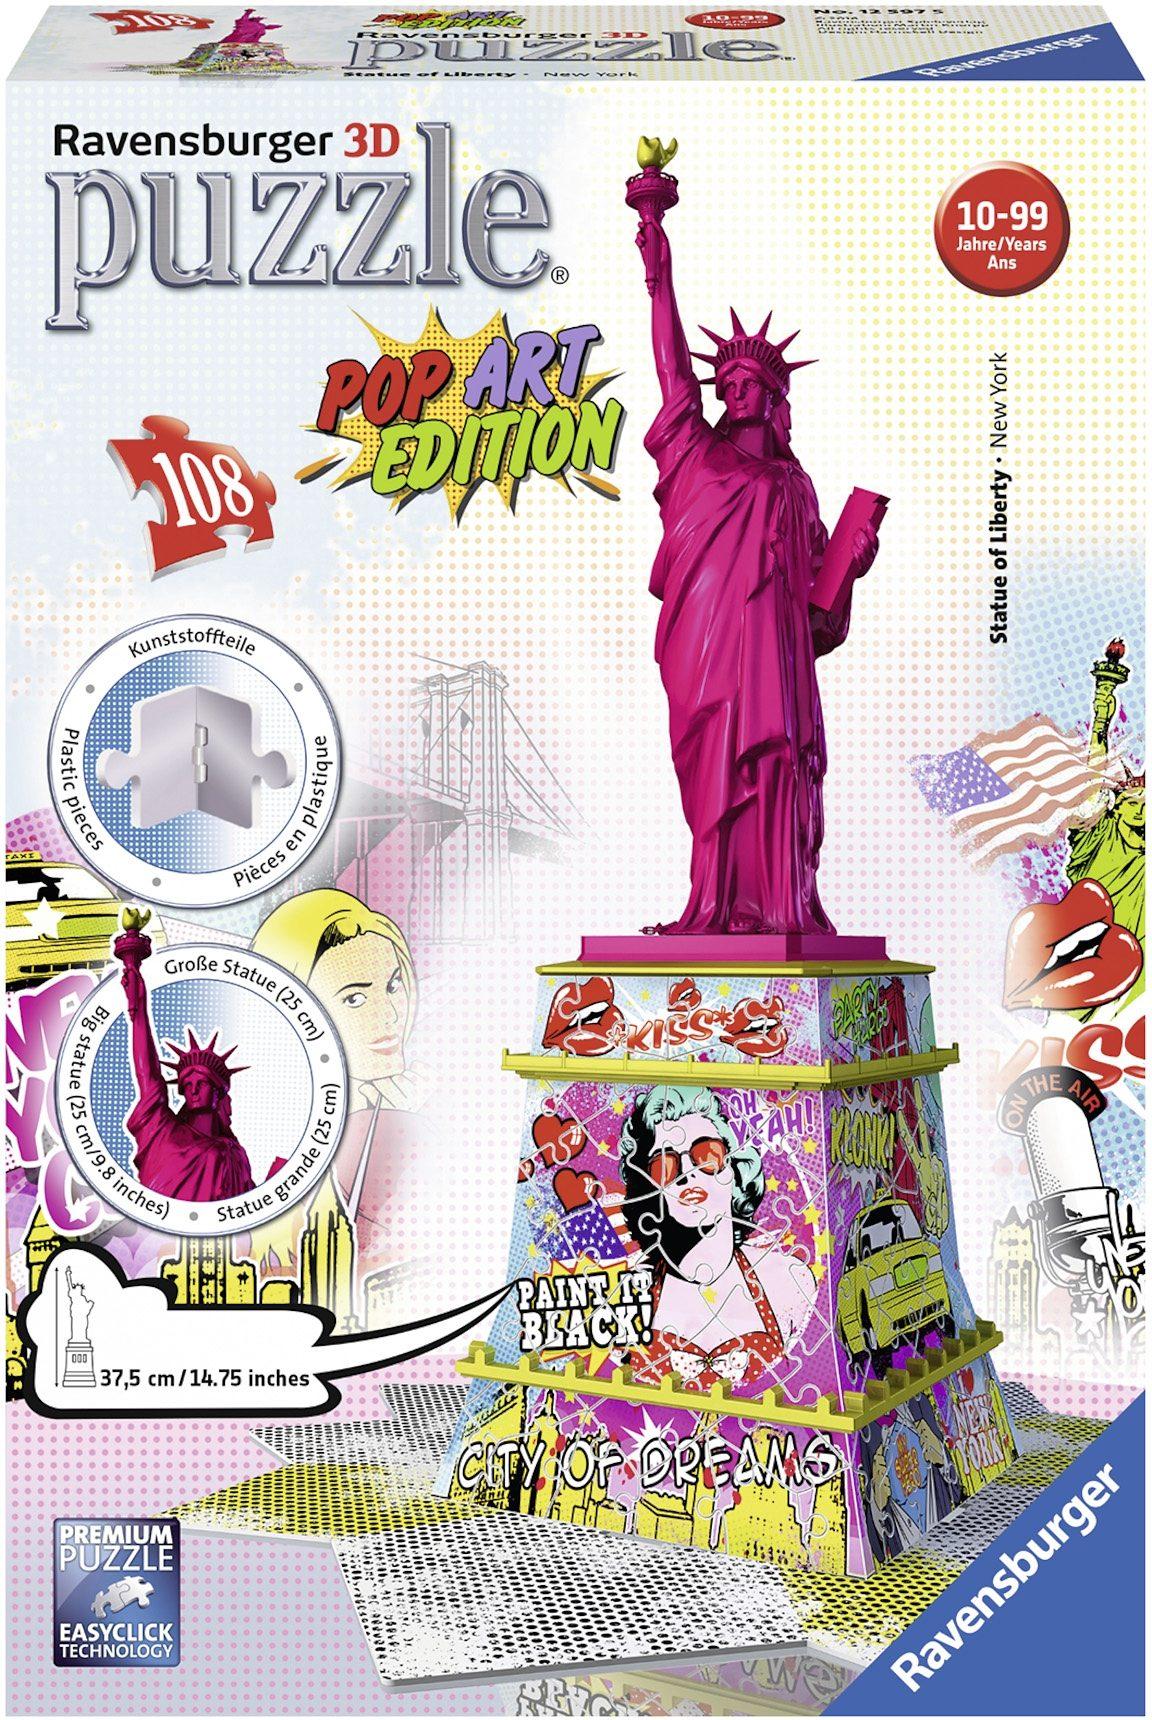 Ravensburger 3D Puzzle, 108 Teile, »Pop Art Edition Freiheitsstatue«